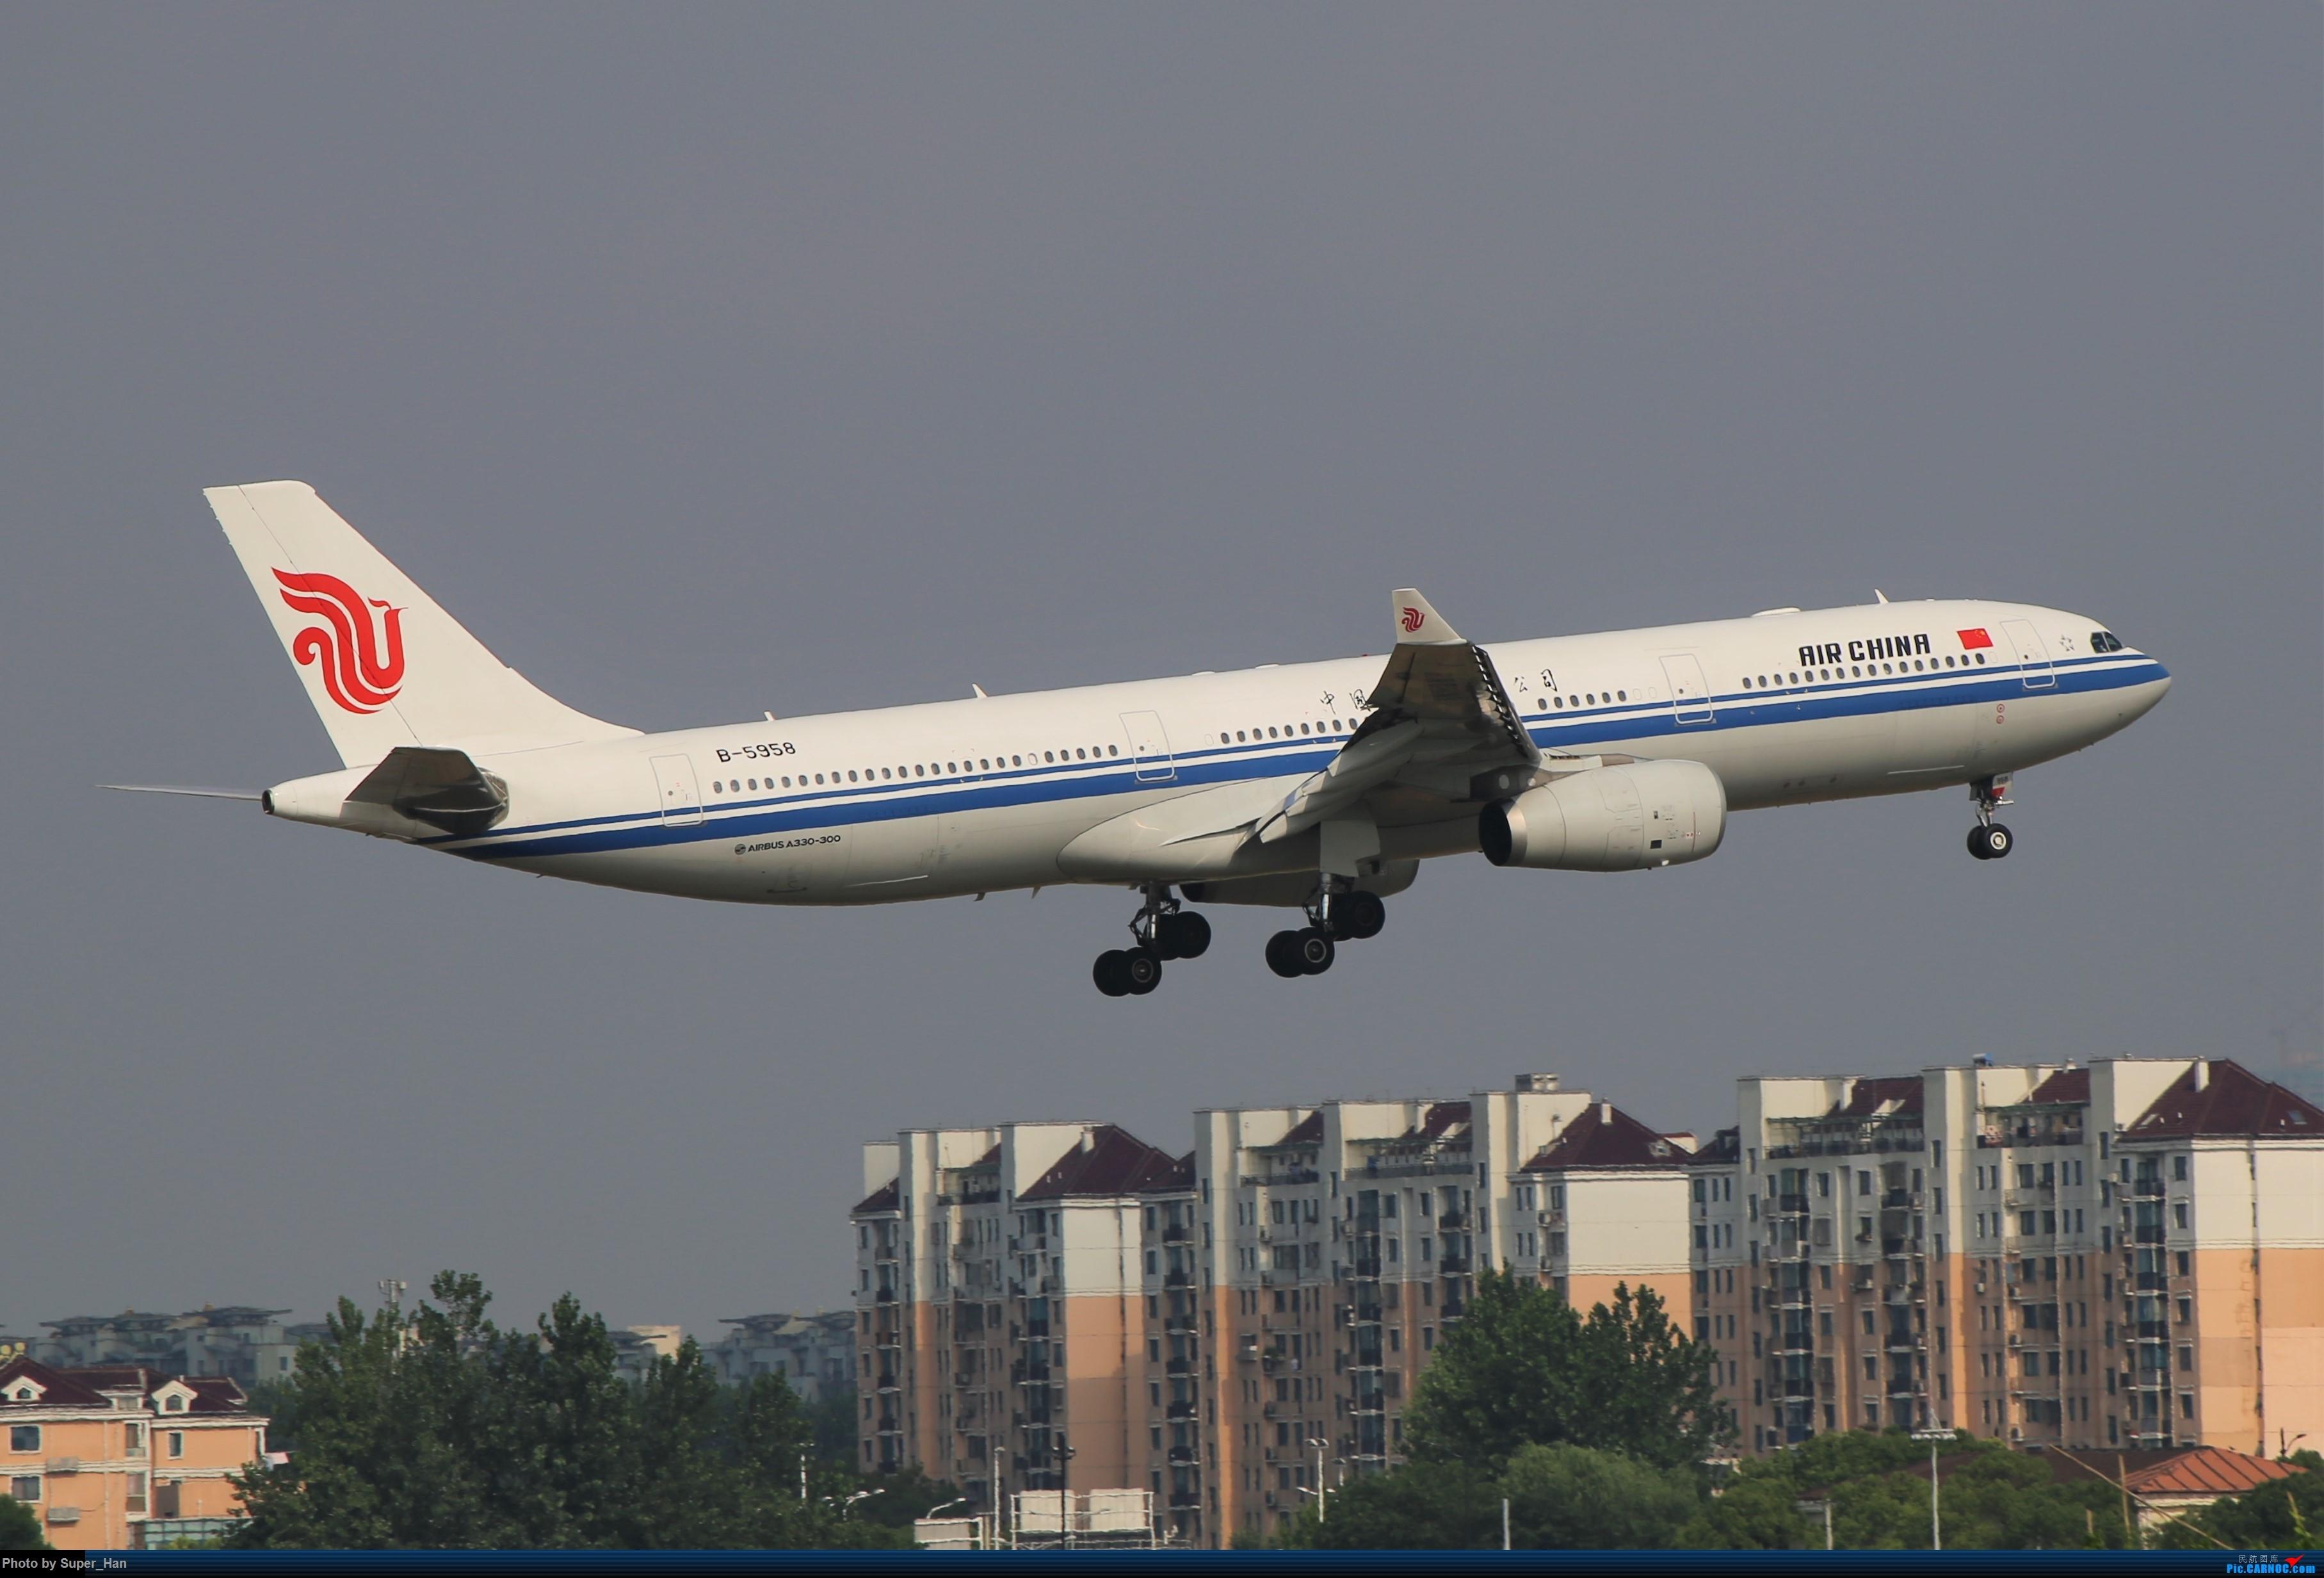 Re:[原创]0715去虹桥说走就走【最多的330篇】 AIRBUS A330-300 B-5958 中国上海虹桥国际机场